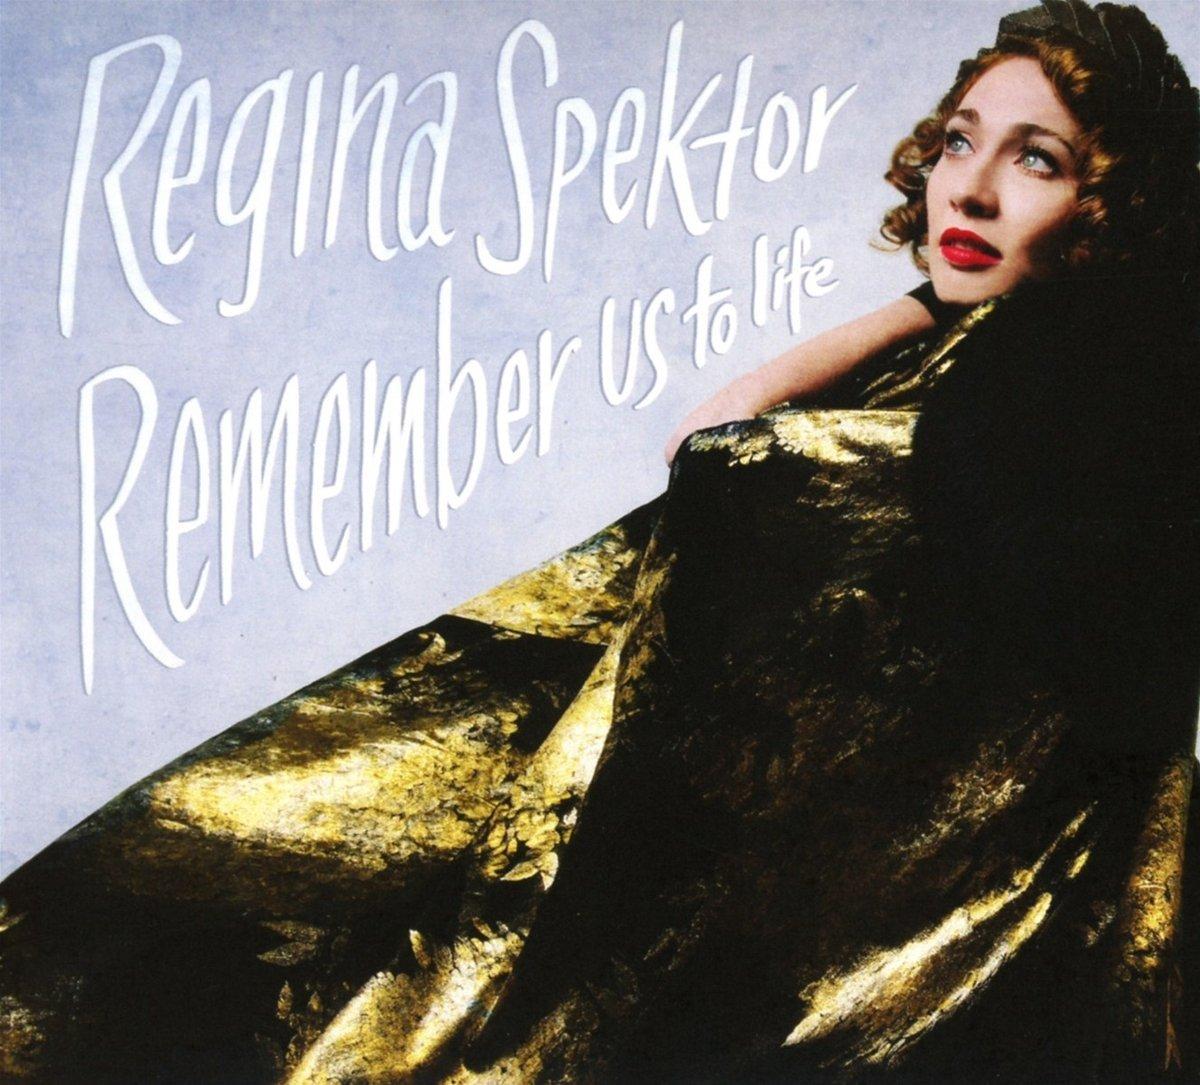 regina-spektor-remember-us-life